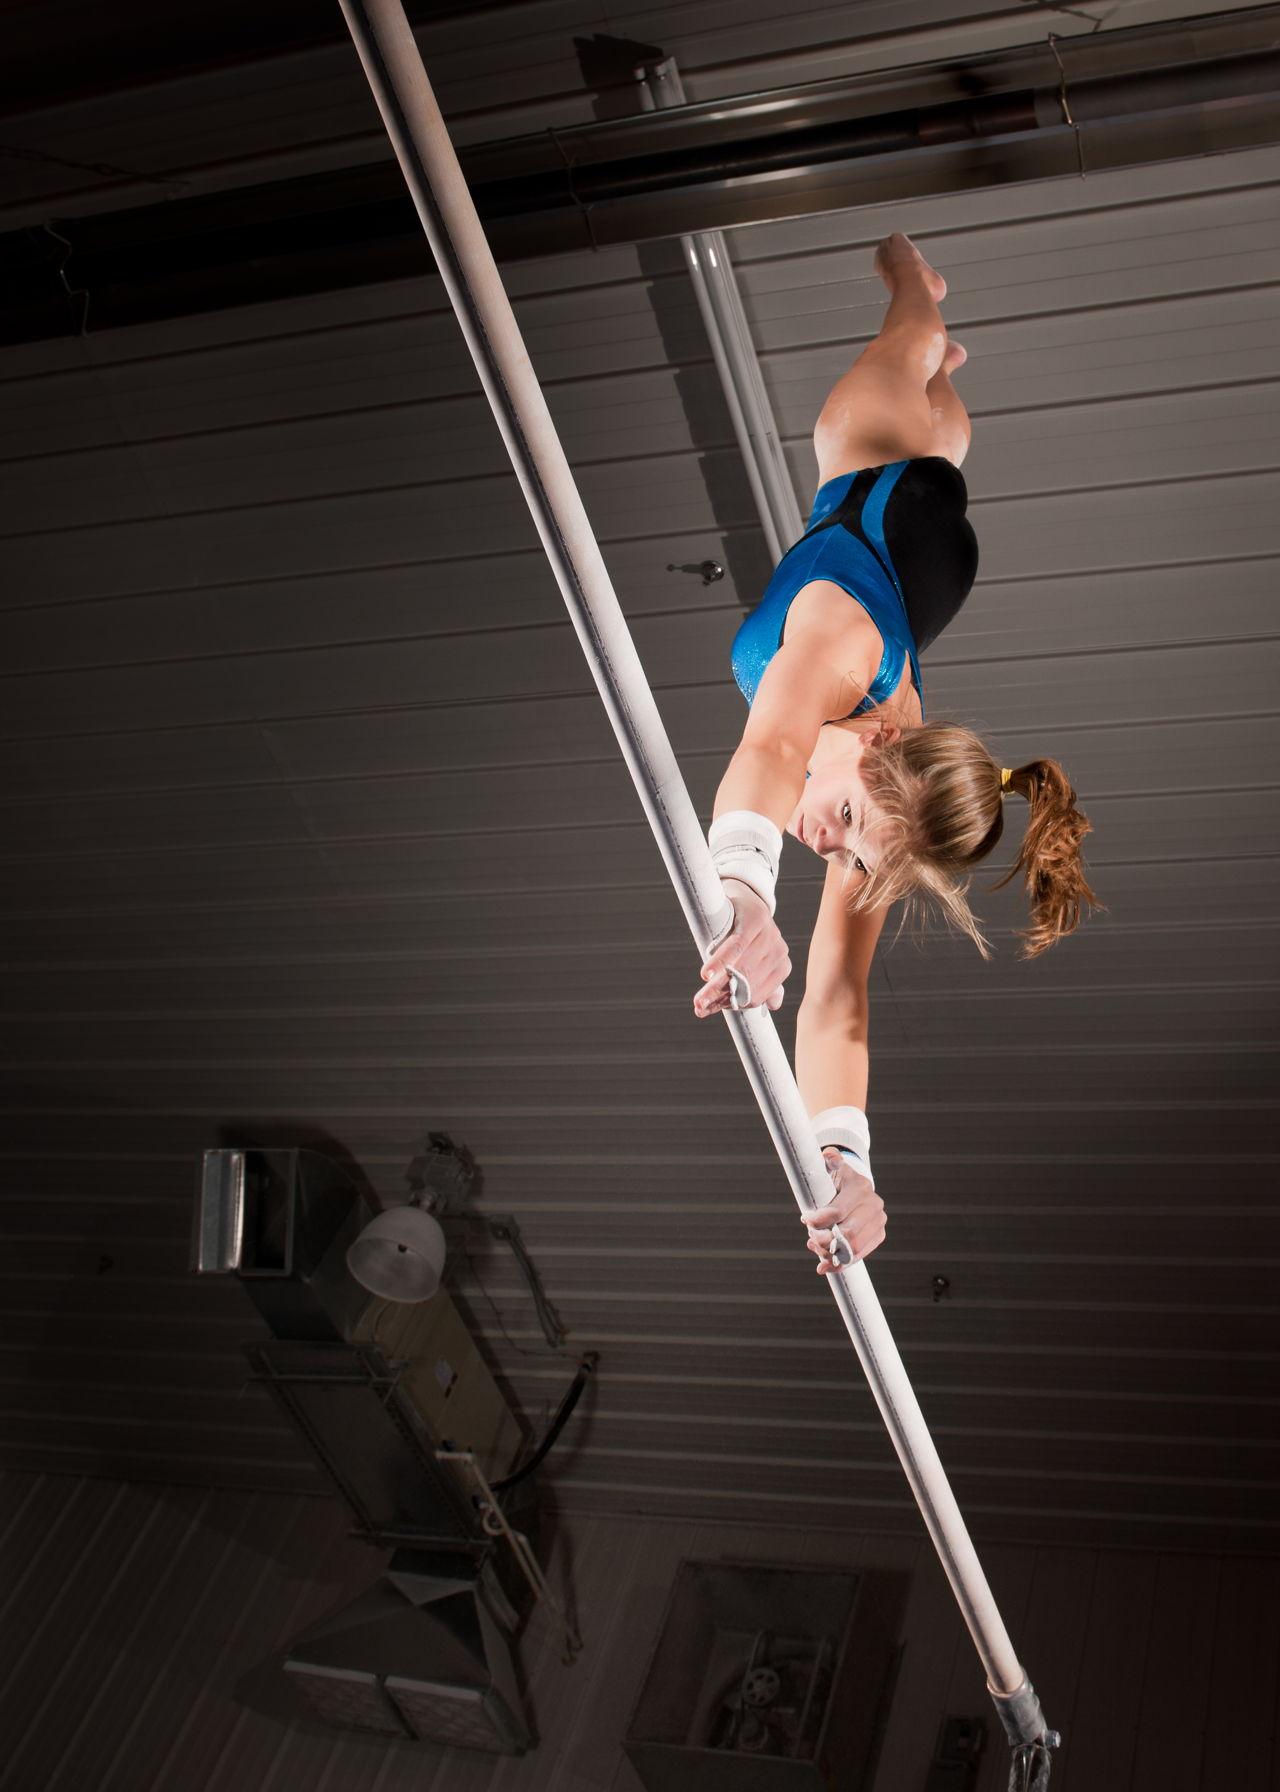 Mastering The Kip In Gymnastics